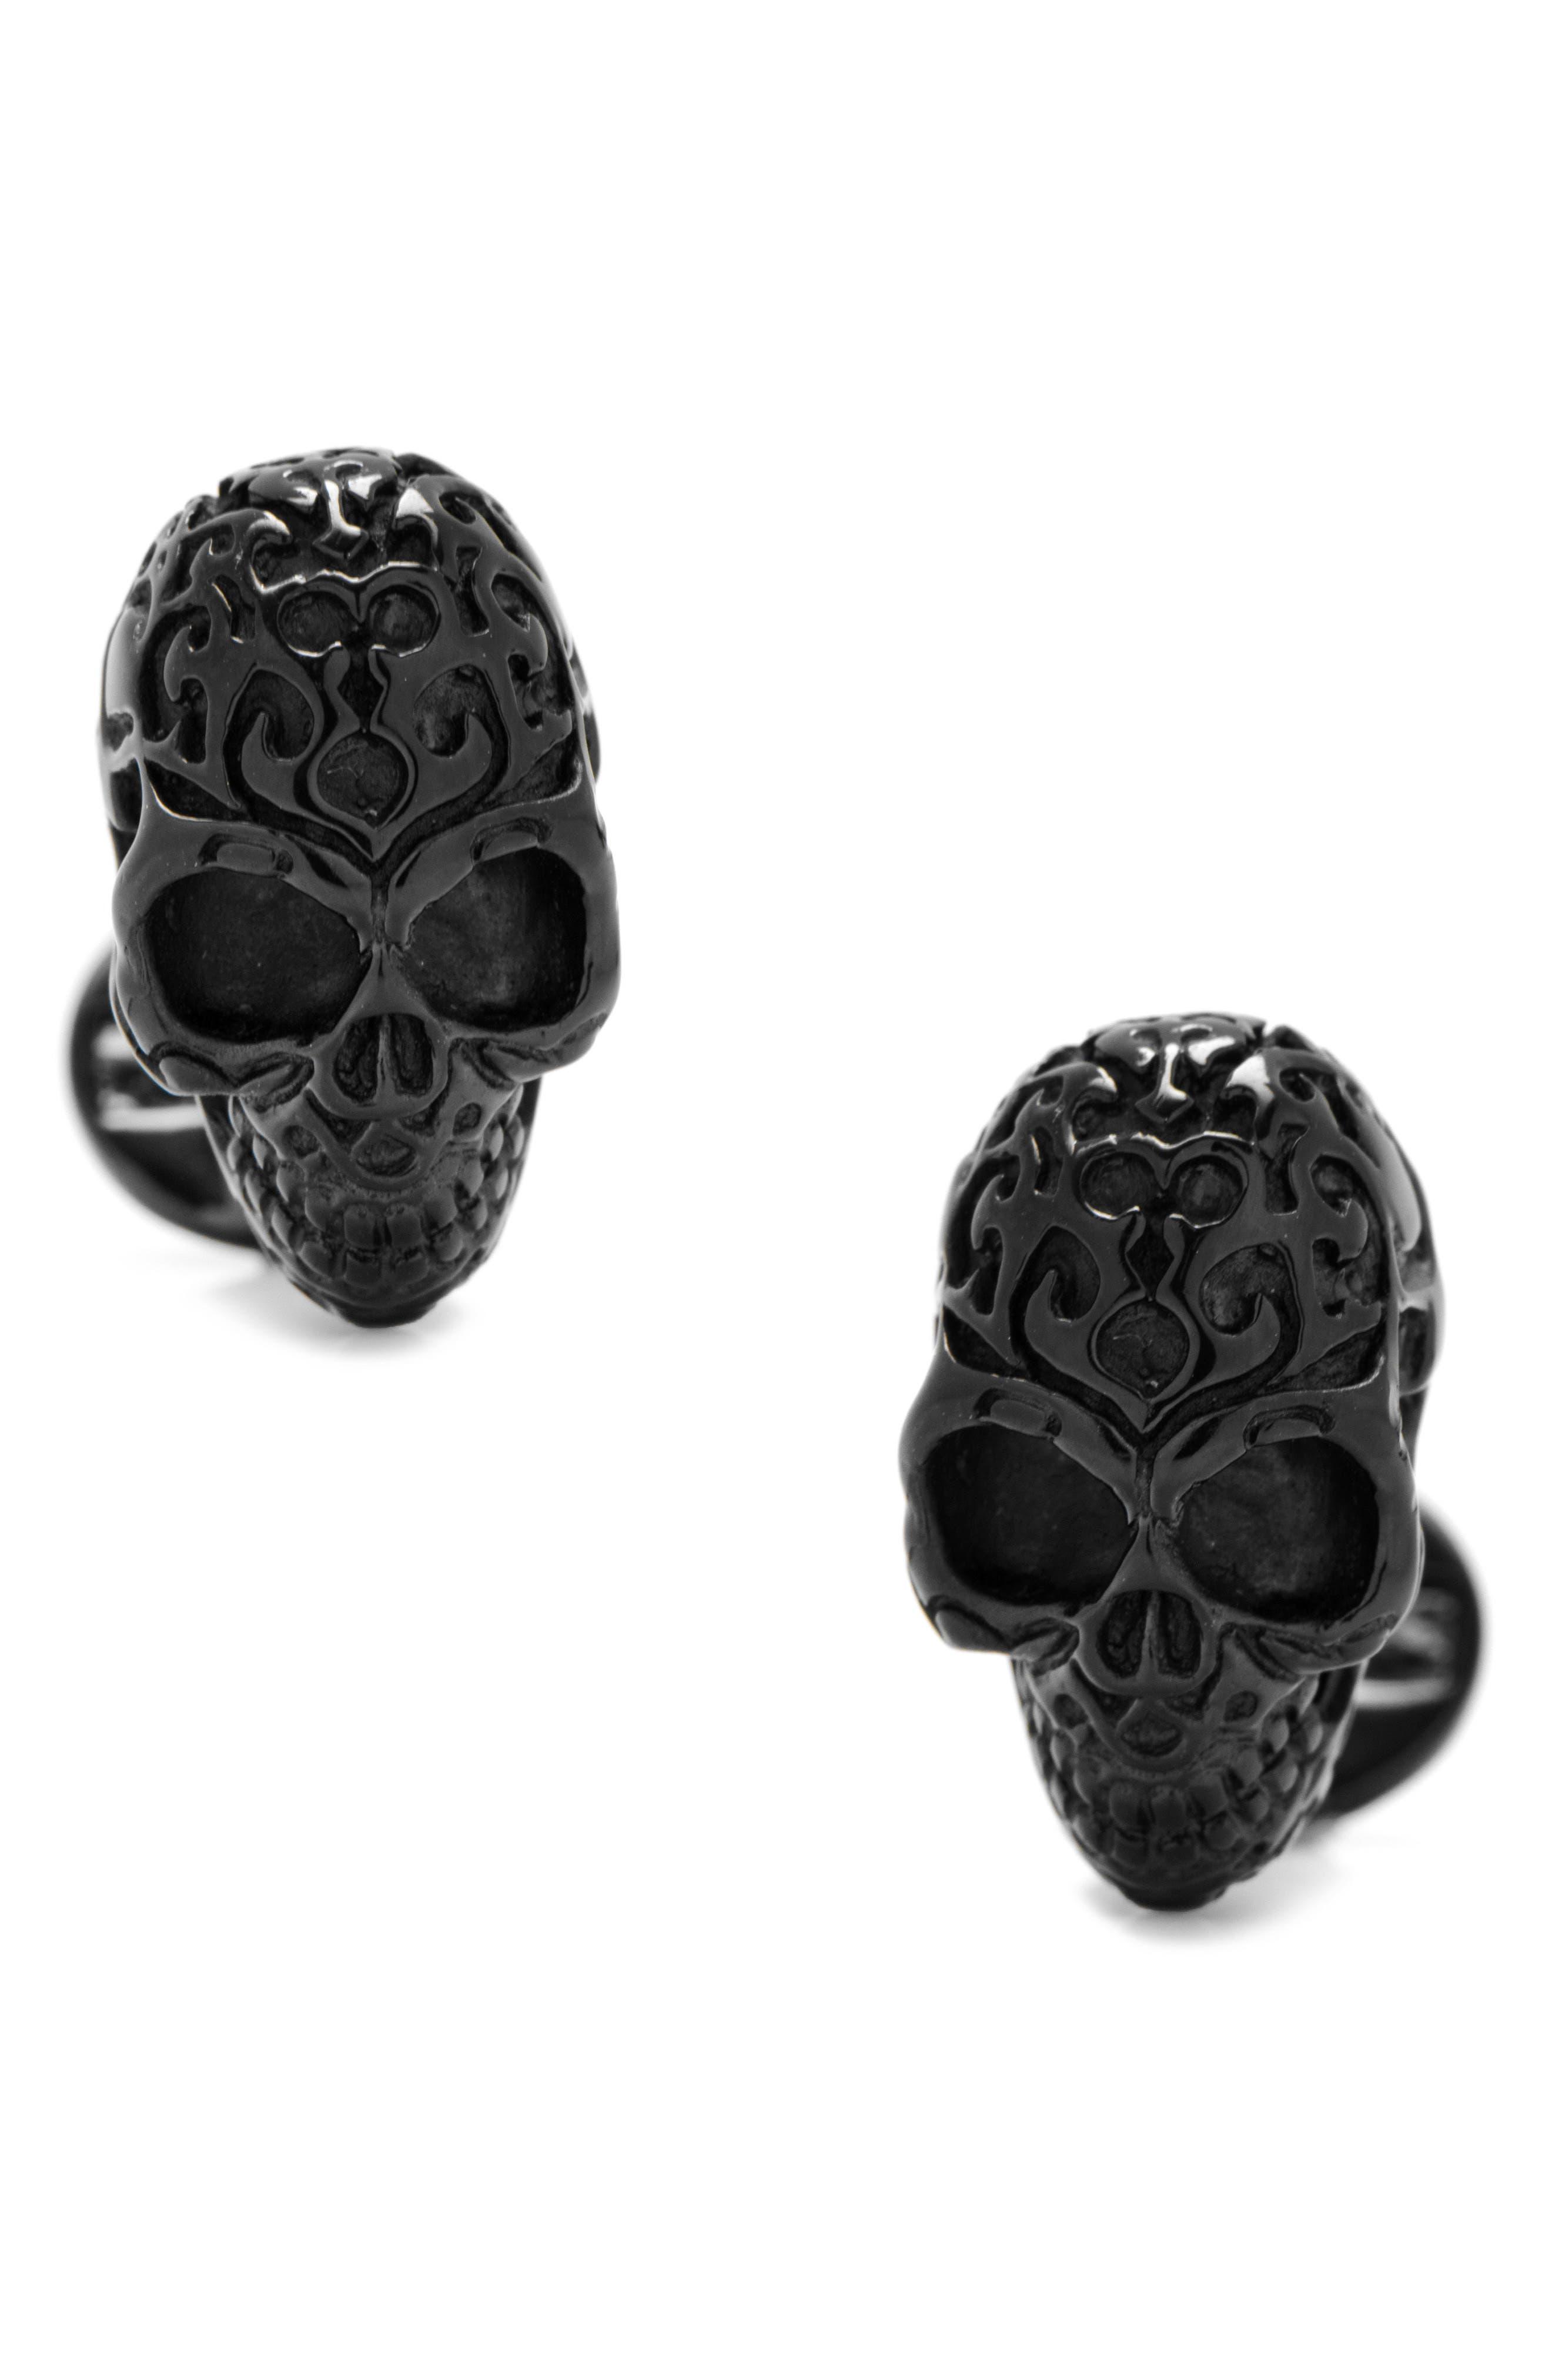 Black Fatale Skull Cuff Links,                             Main thumbnail 1, color,                             BLACK